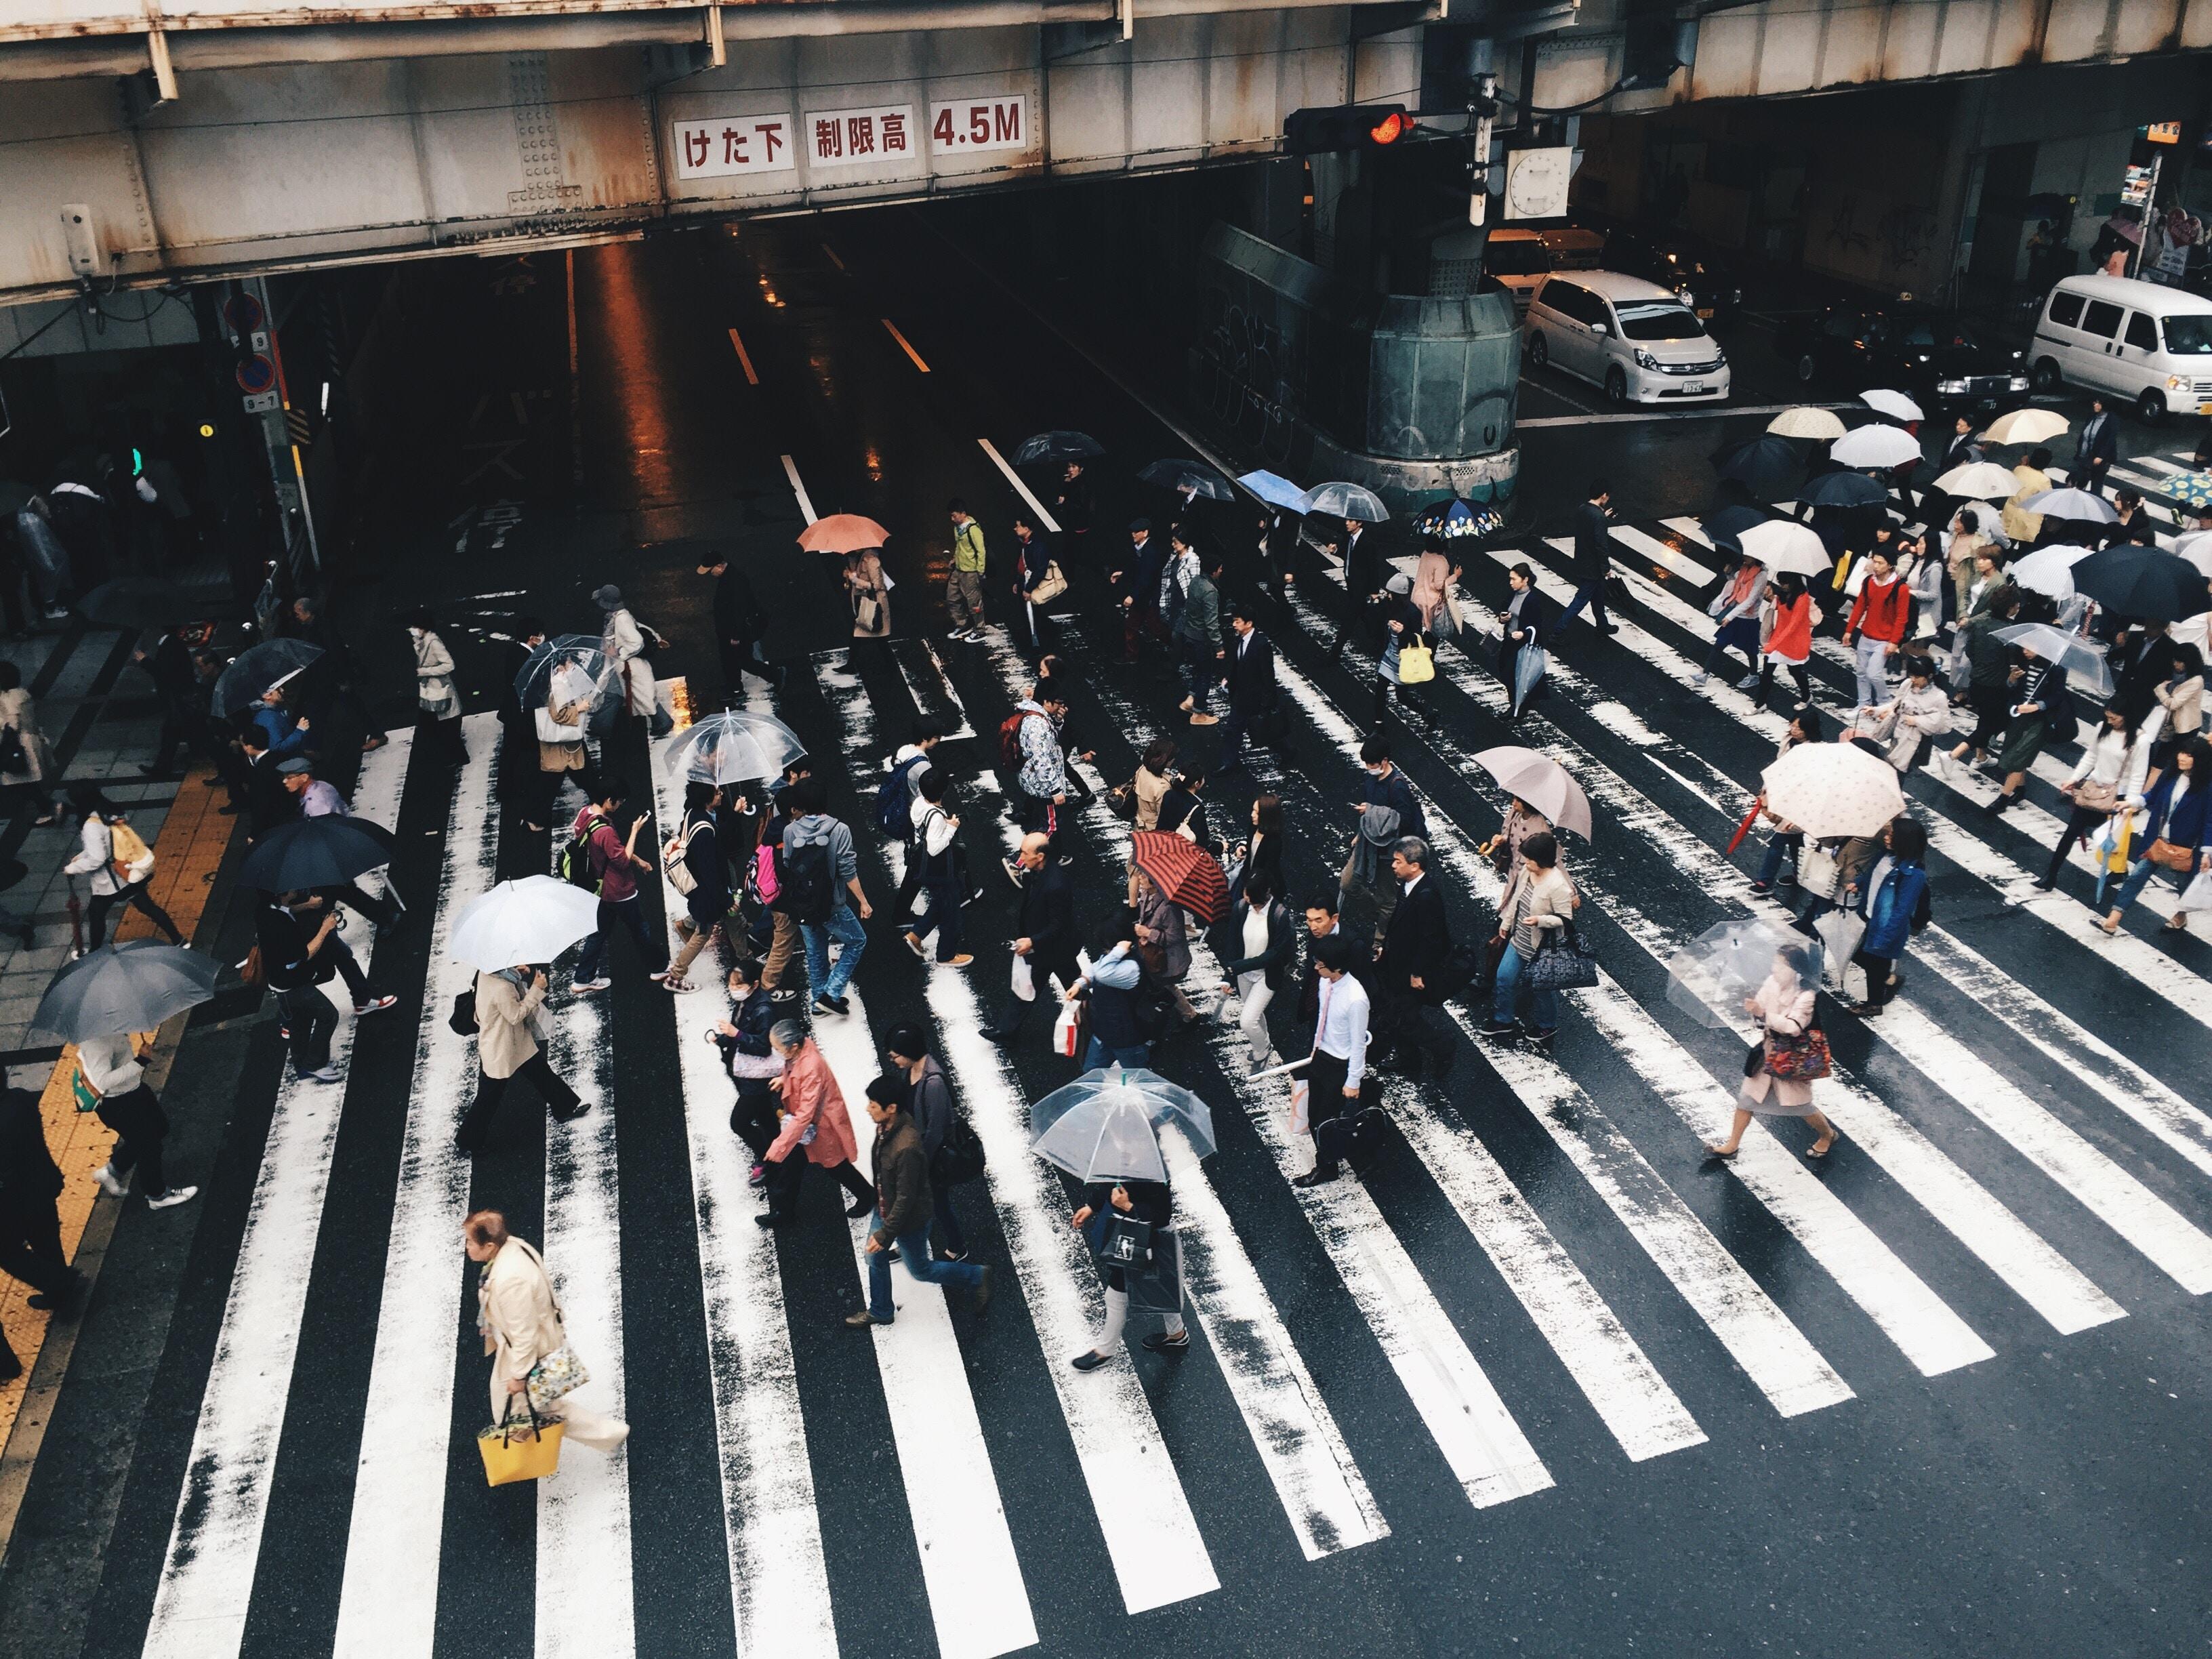 people crossing on pedestrian lane while raining